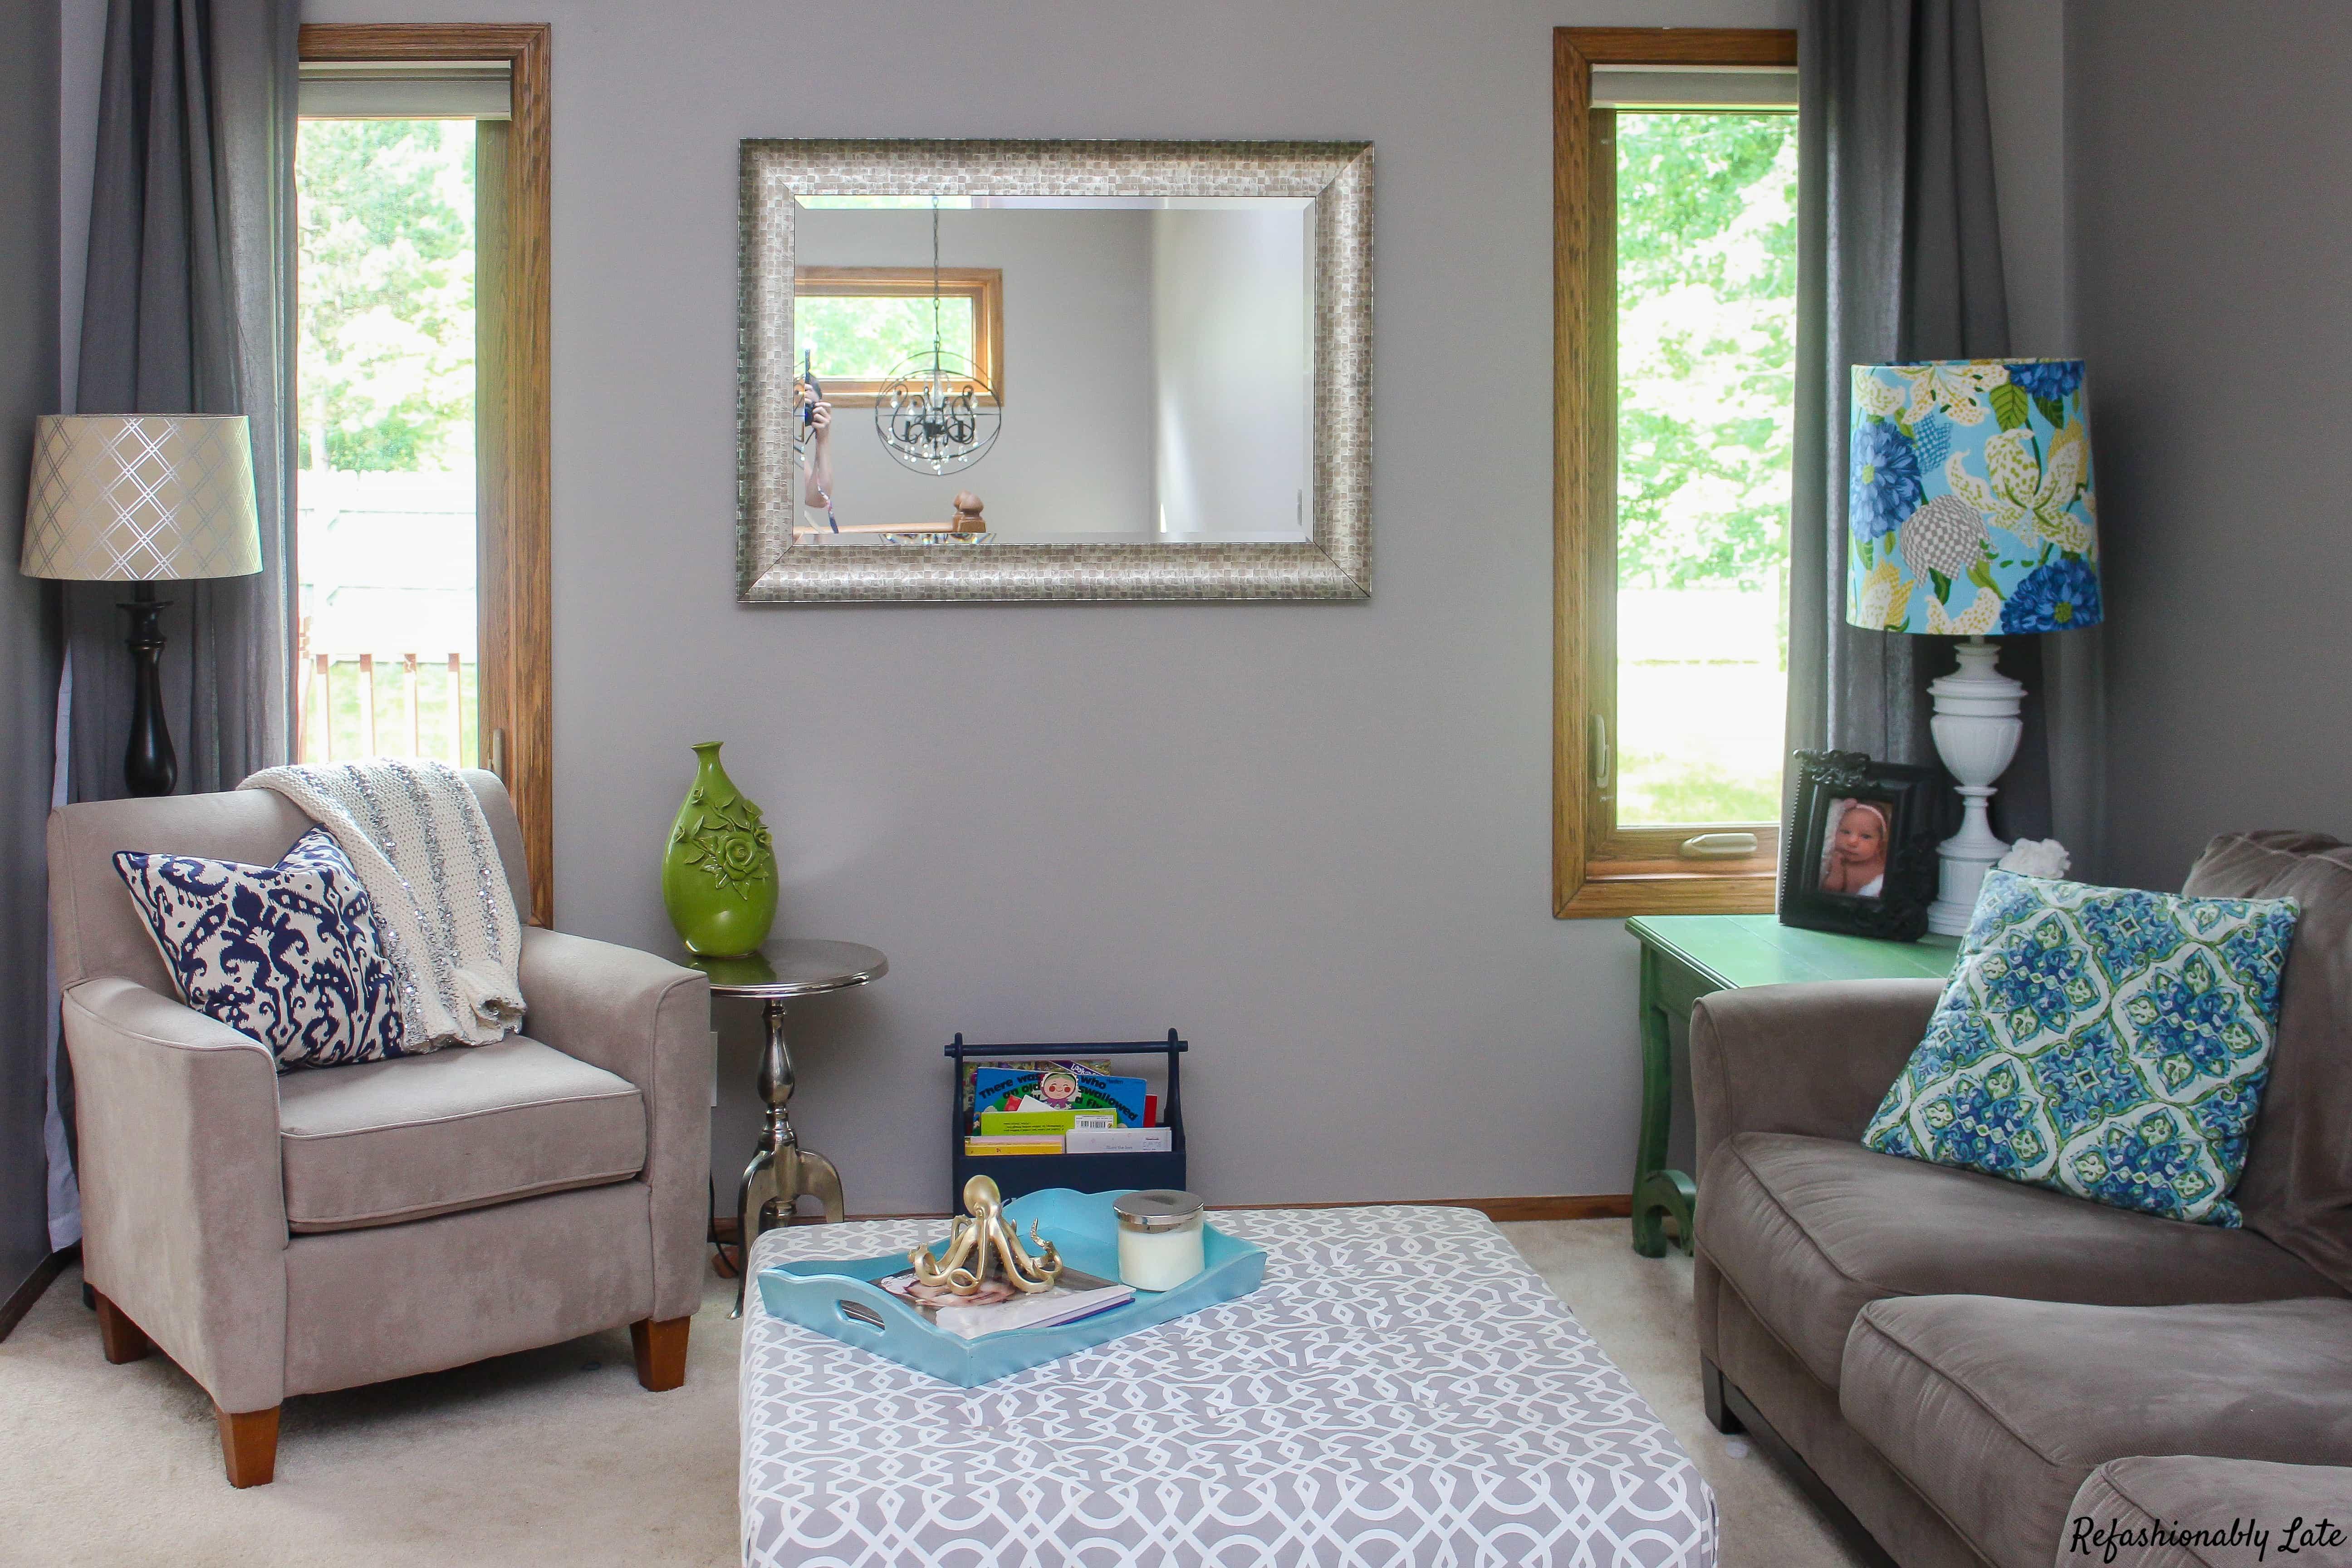 One Room Challenge Week 1 Living Room - www.refashionablylate.com